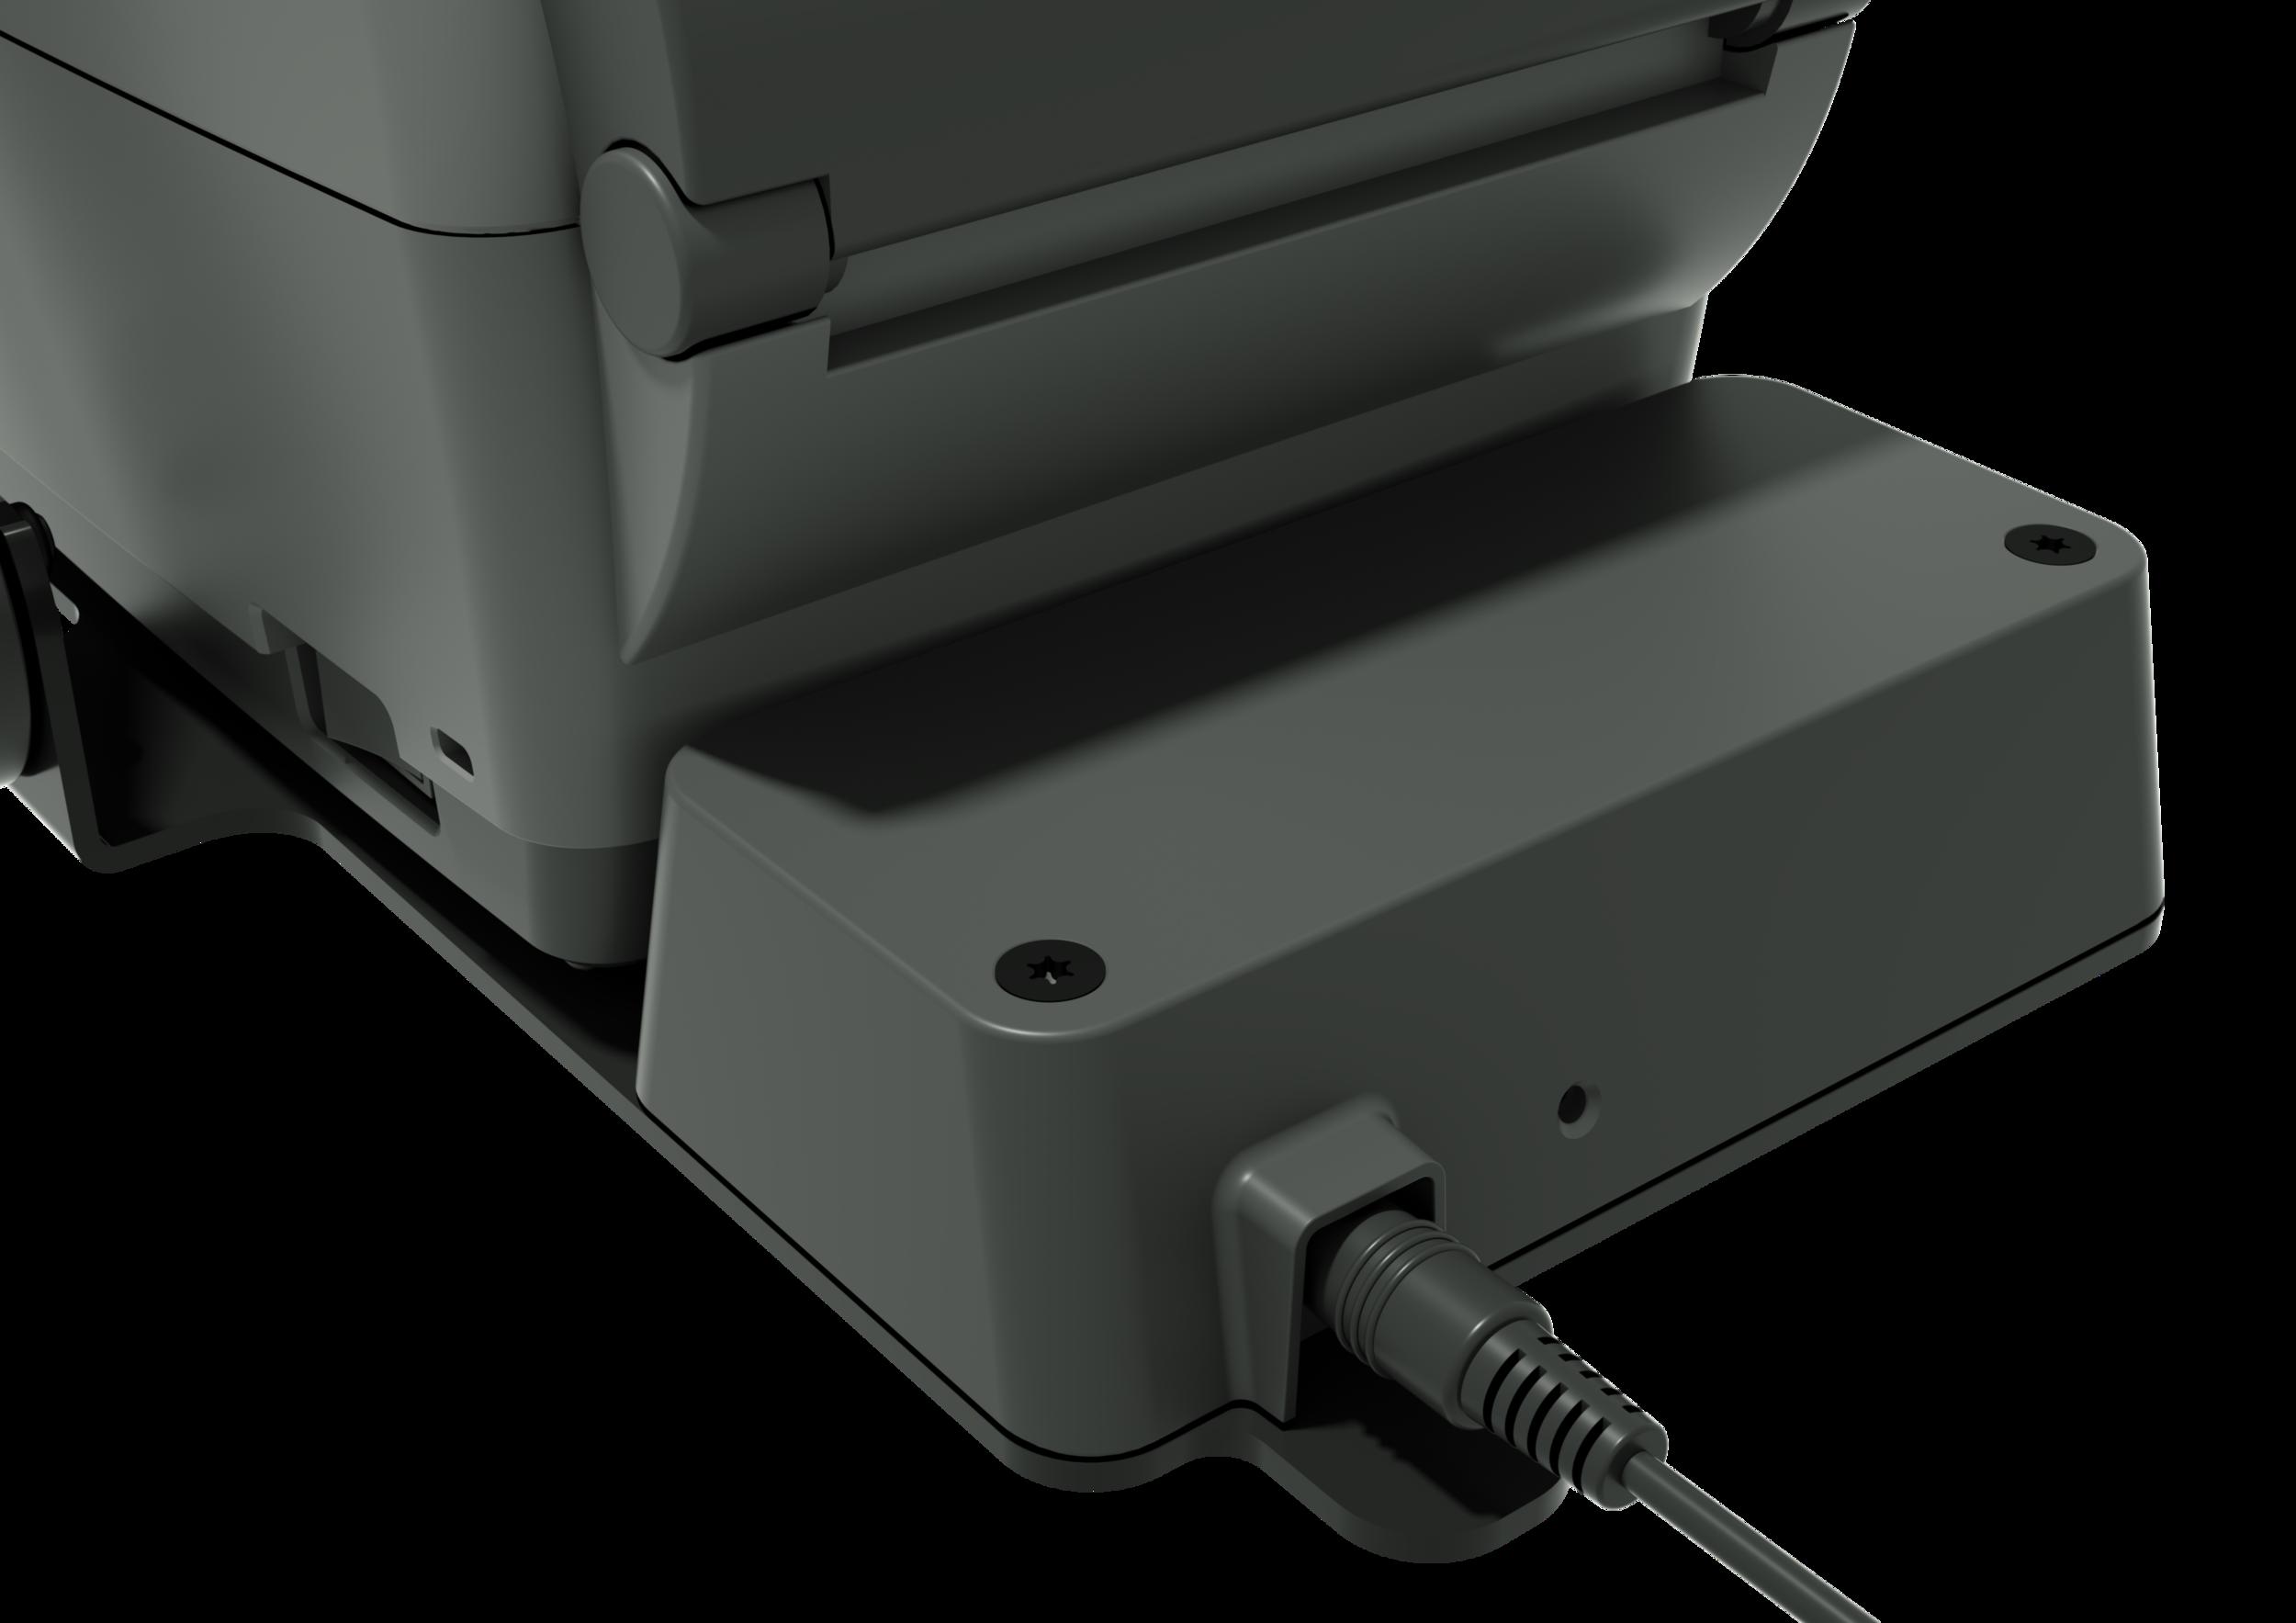 Falcona ConnectID Printer (Honeywell) - PSU Cover